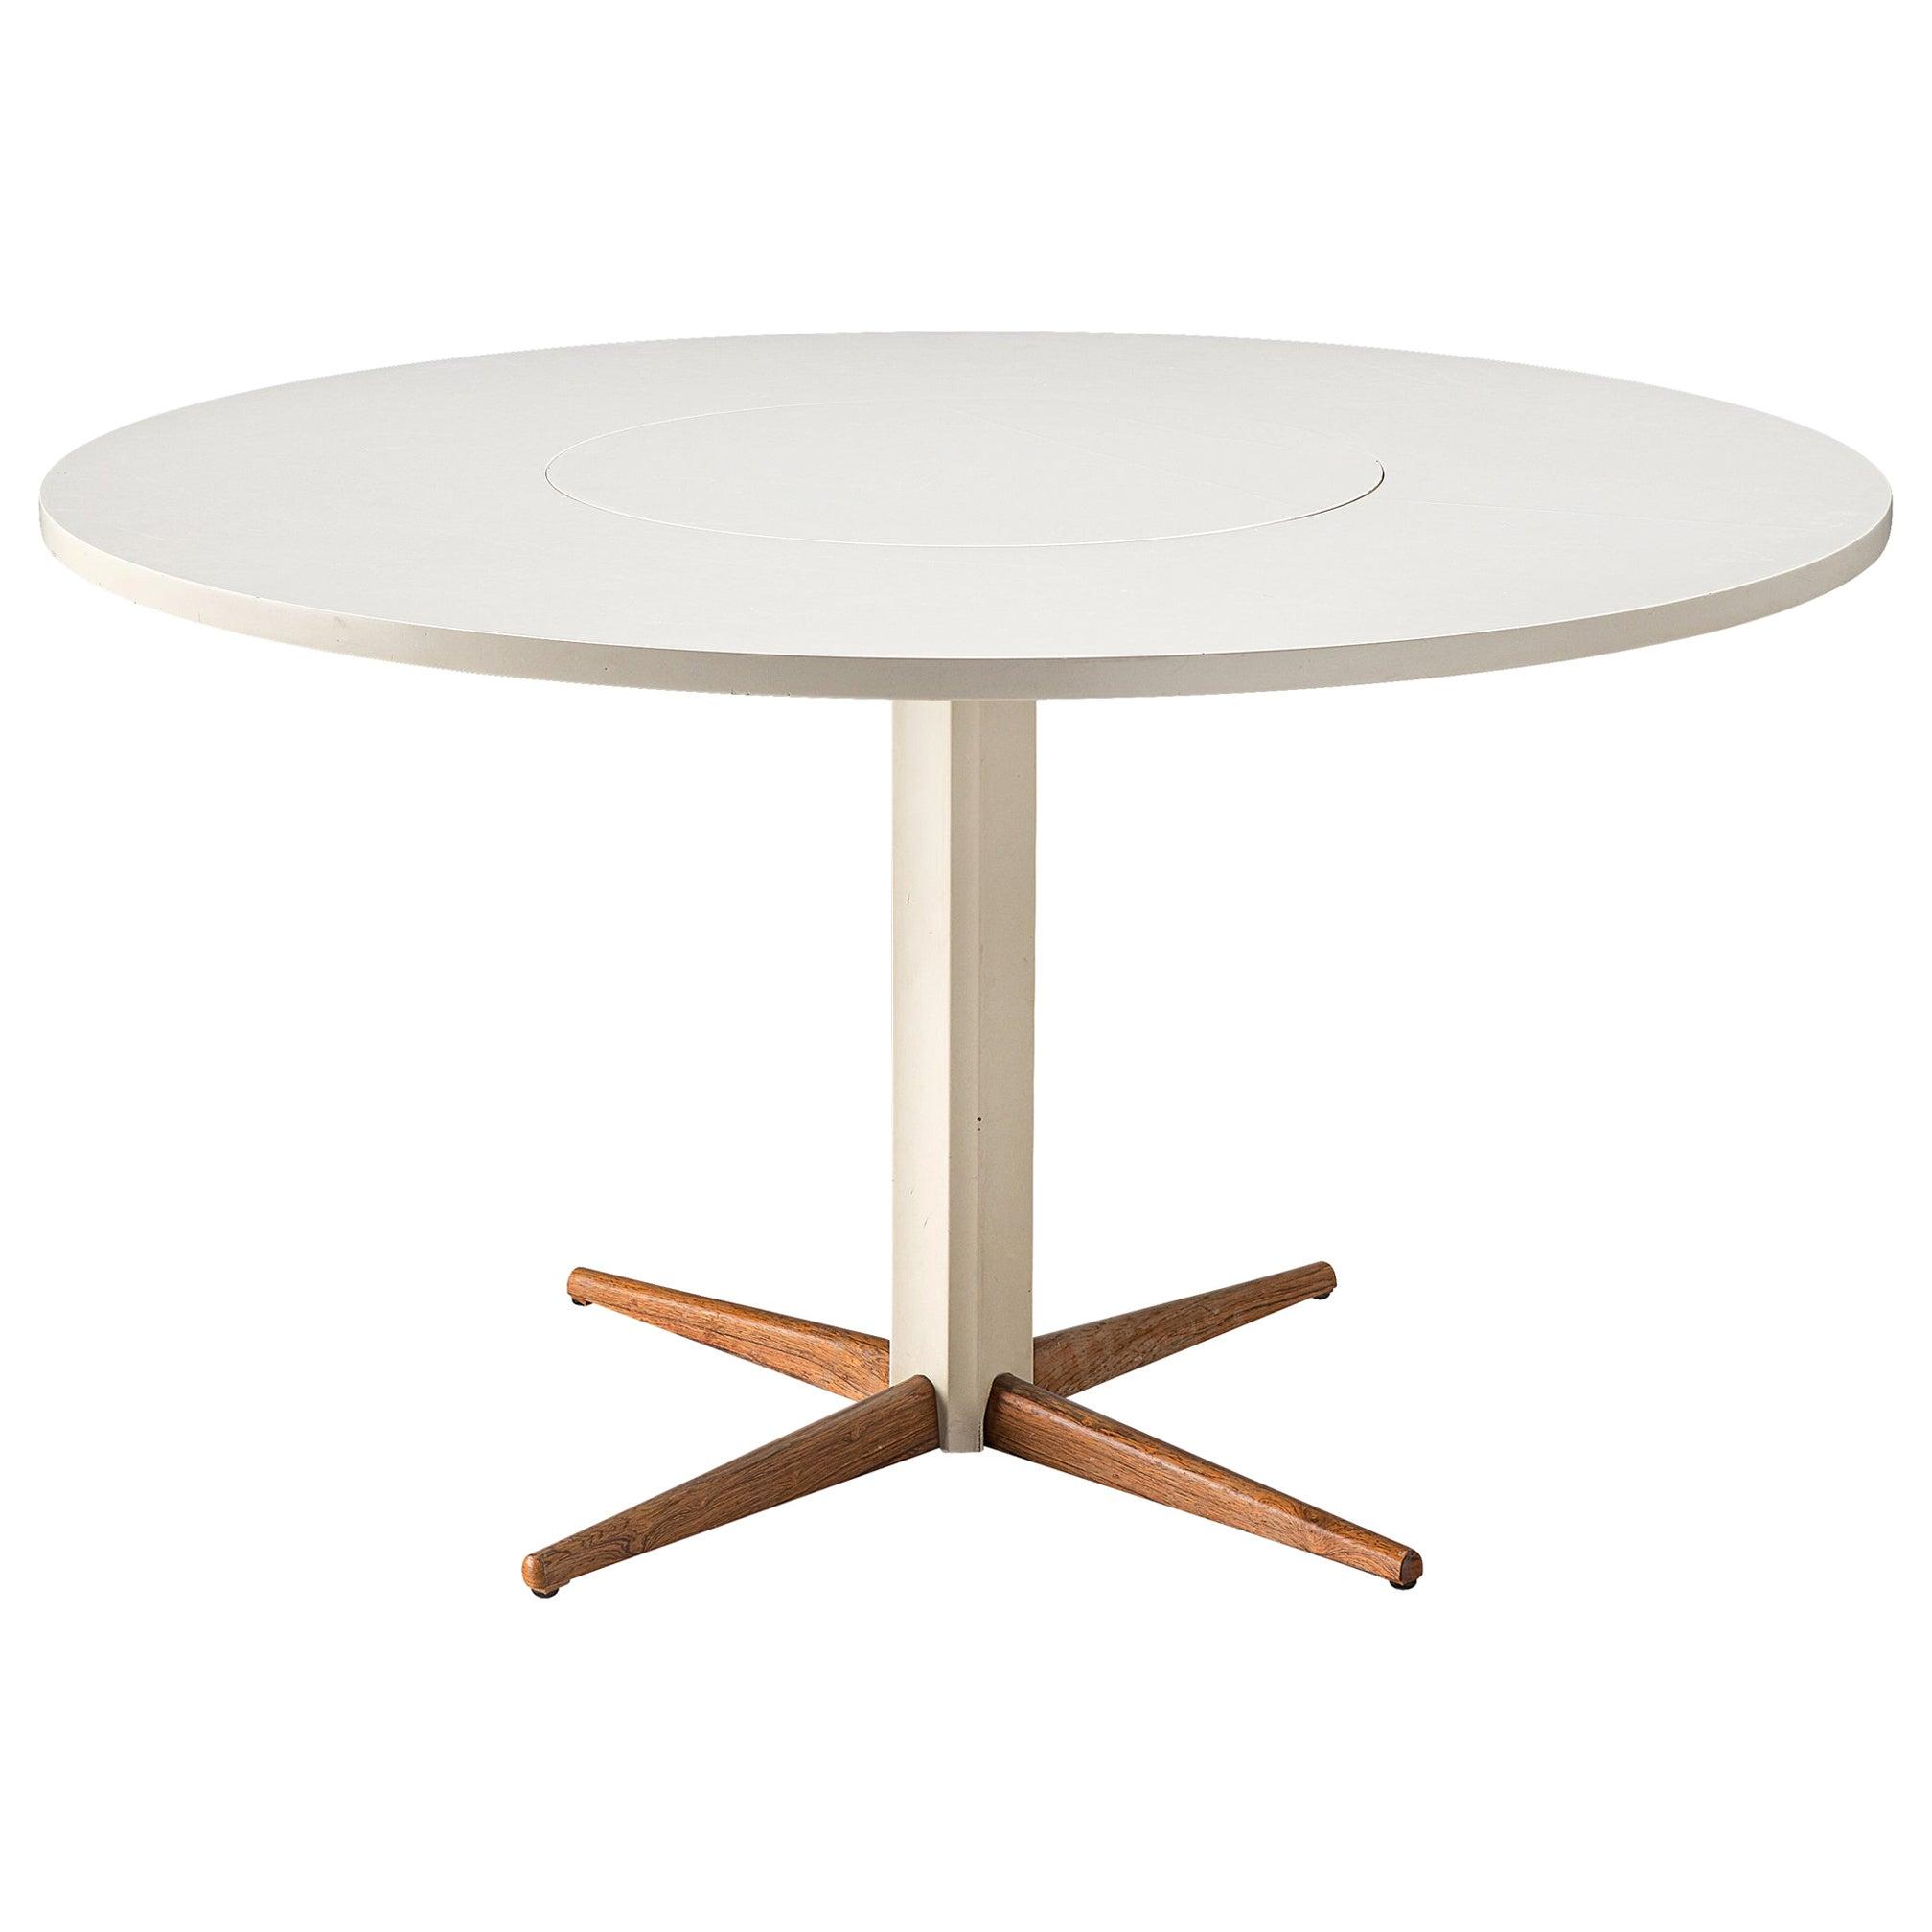 Nanna Ditzel for Kolds Savvaerk Round Pedestal Table